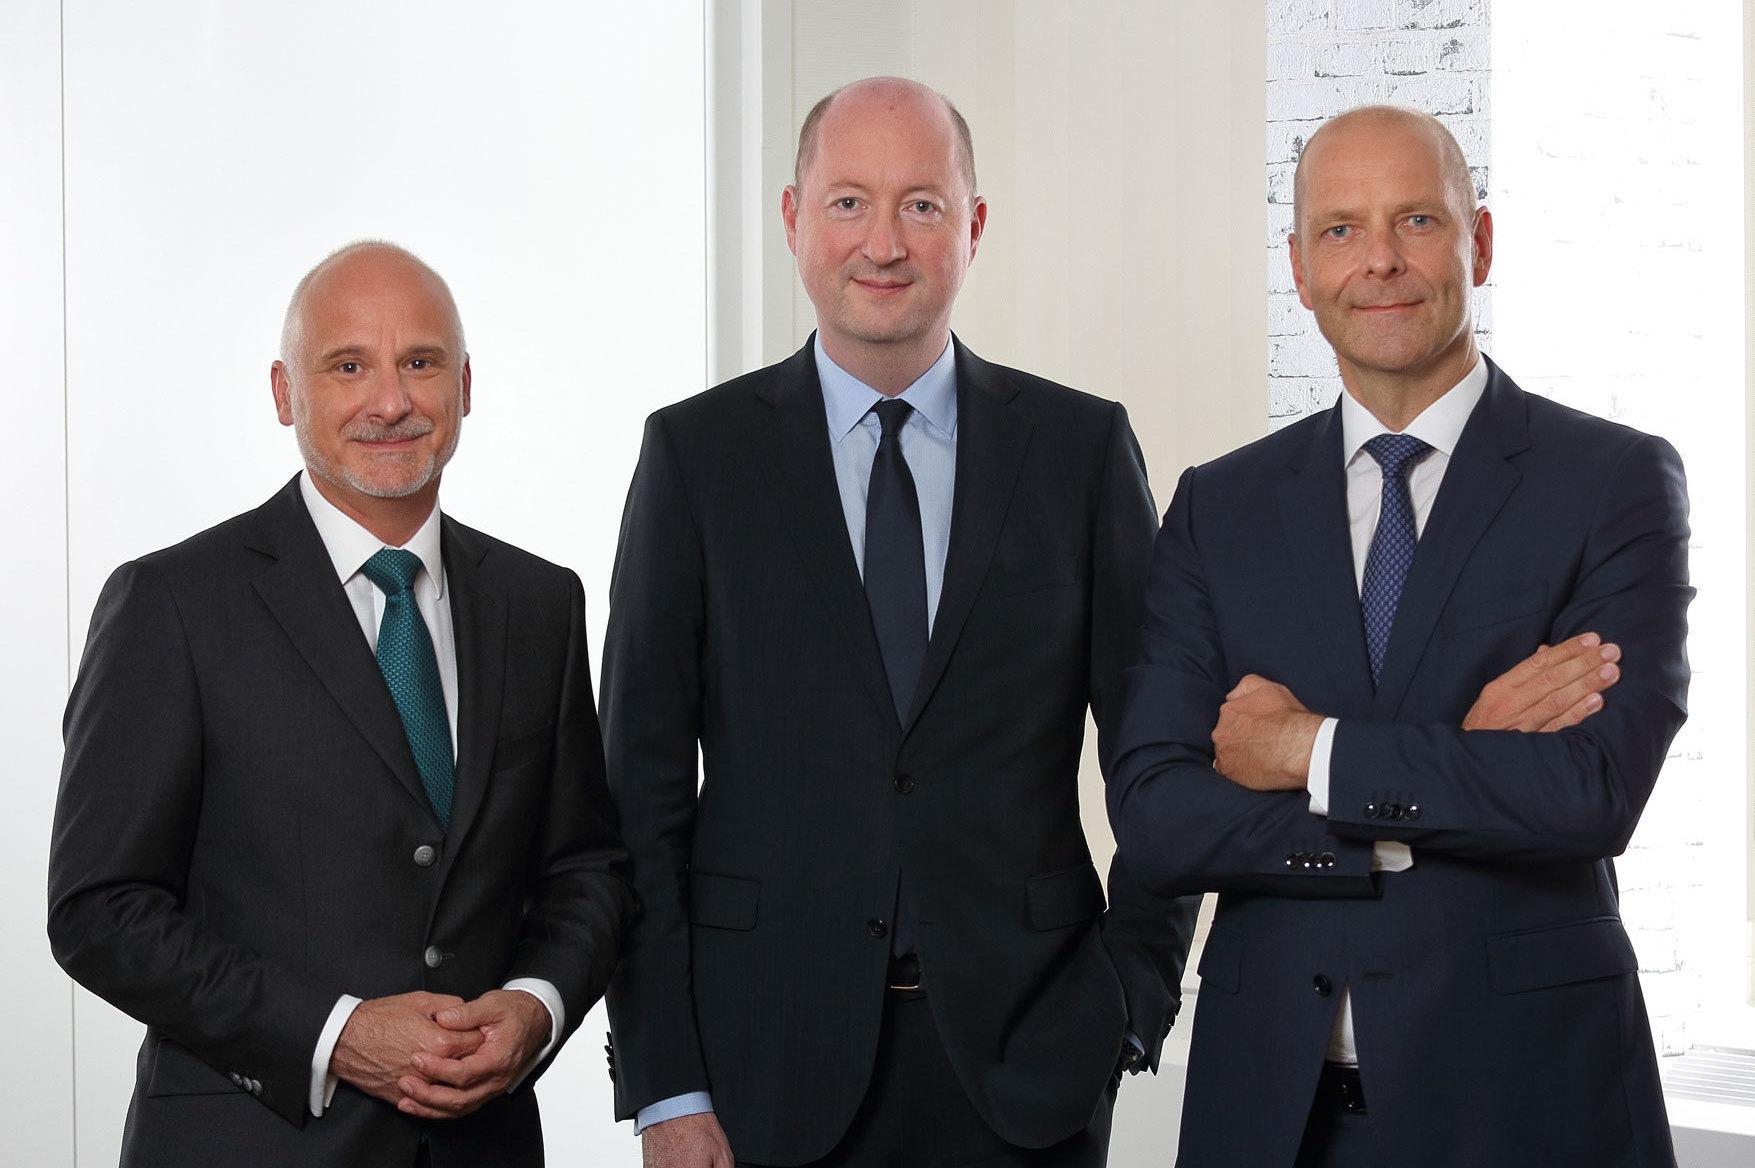 Rainer Herr, Hansjoerg Patzschke and Dirk Brandes,